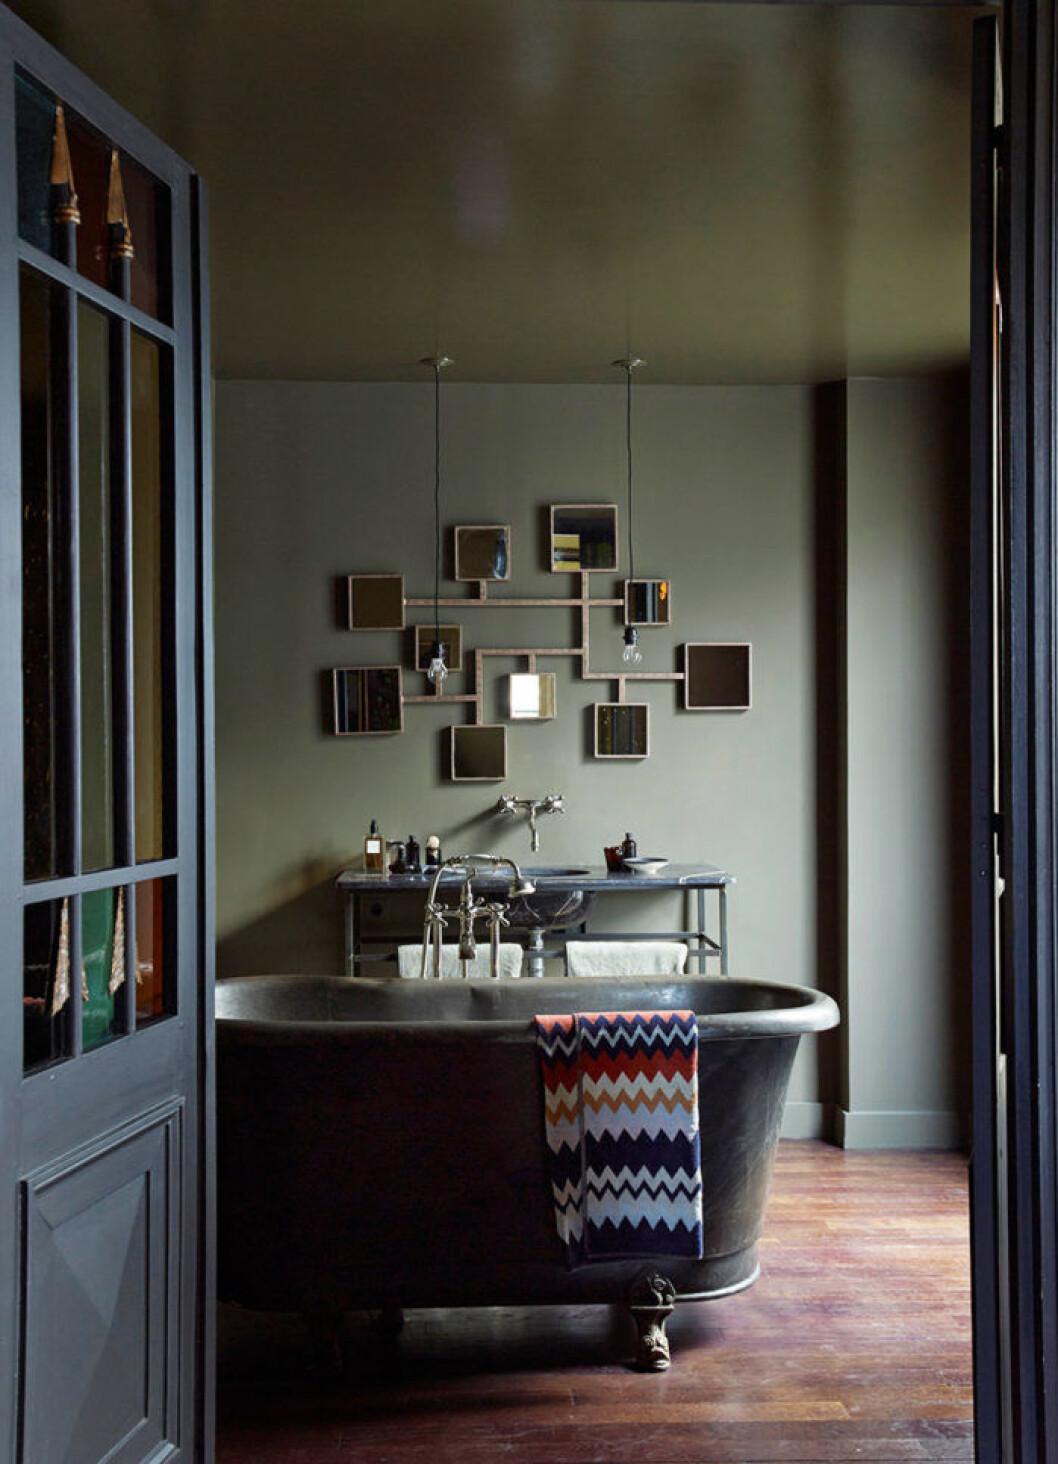 badrum_badkar_bathroom_bathtub_rustic_modern_Foto_Gaelle_Le_Boulicaut